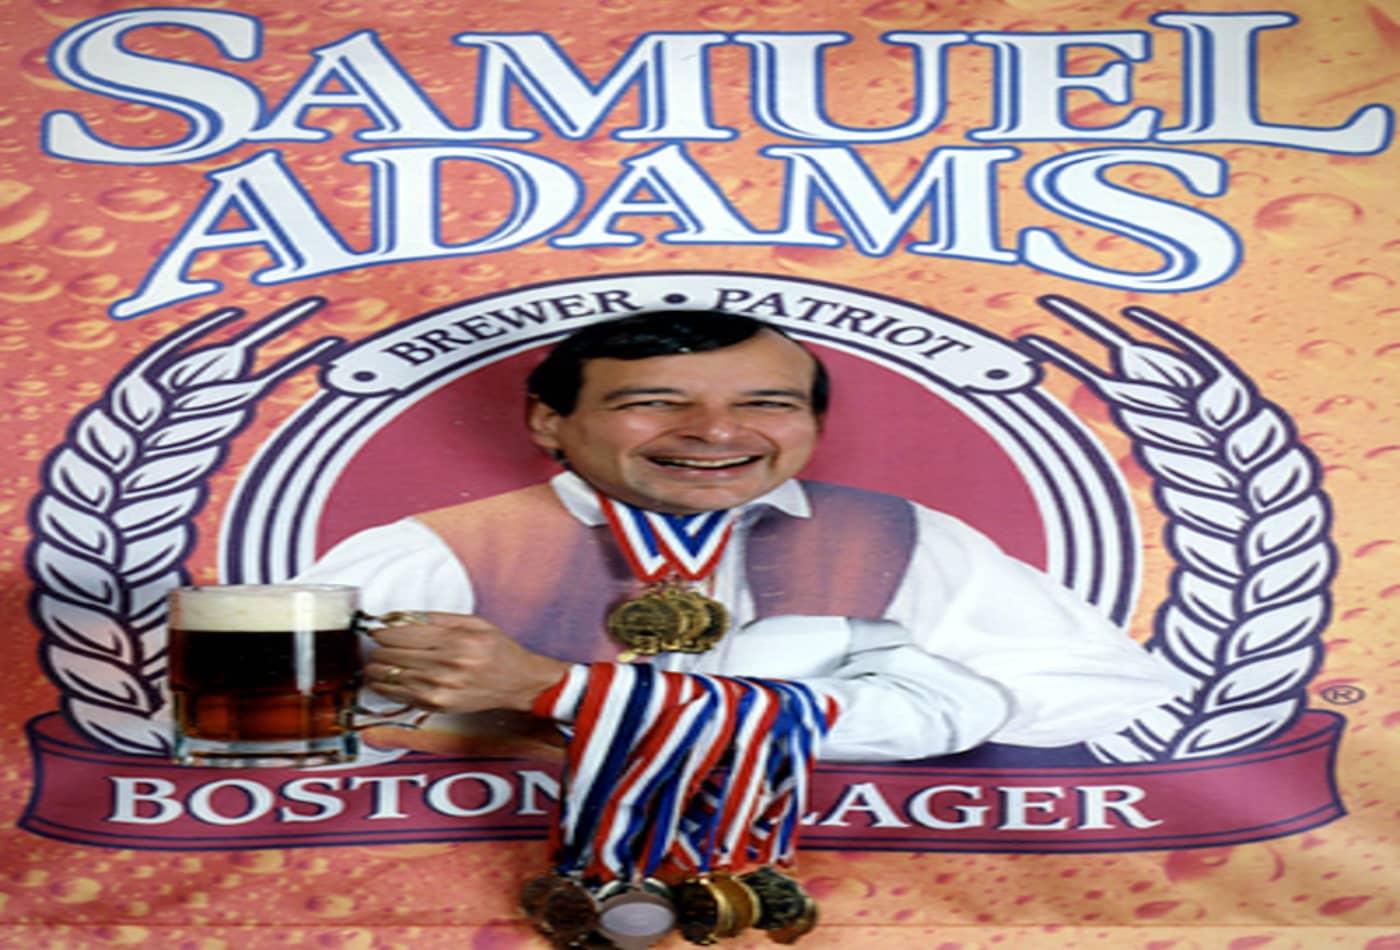 how-i-built-my-business-sam-adams-medals.jpg